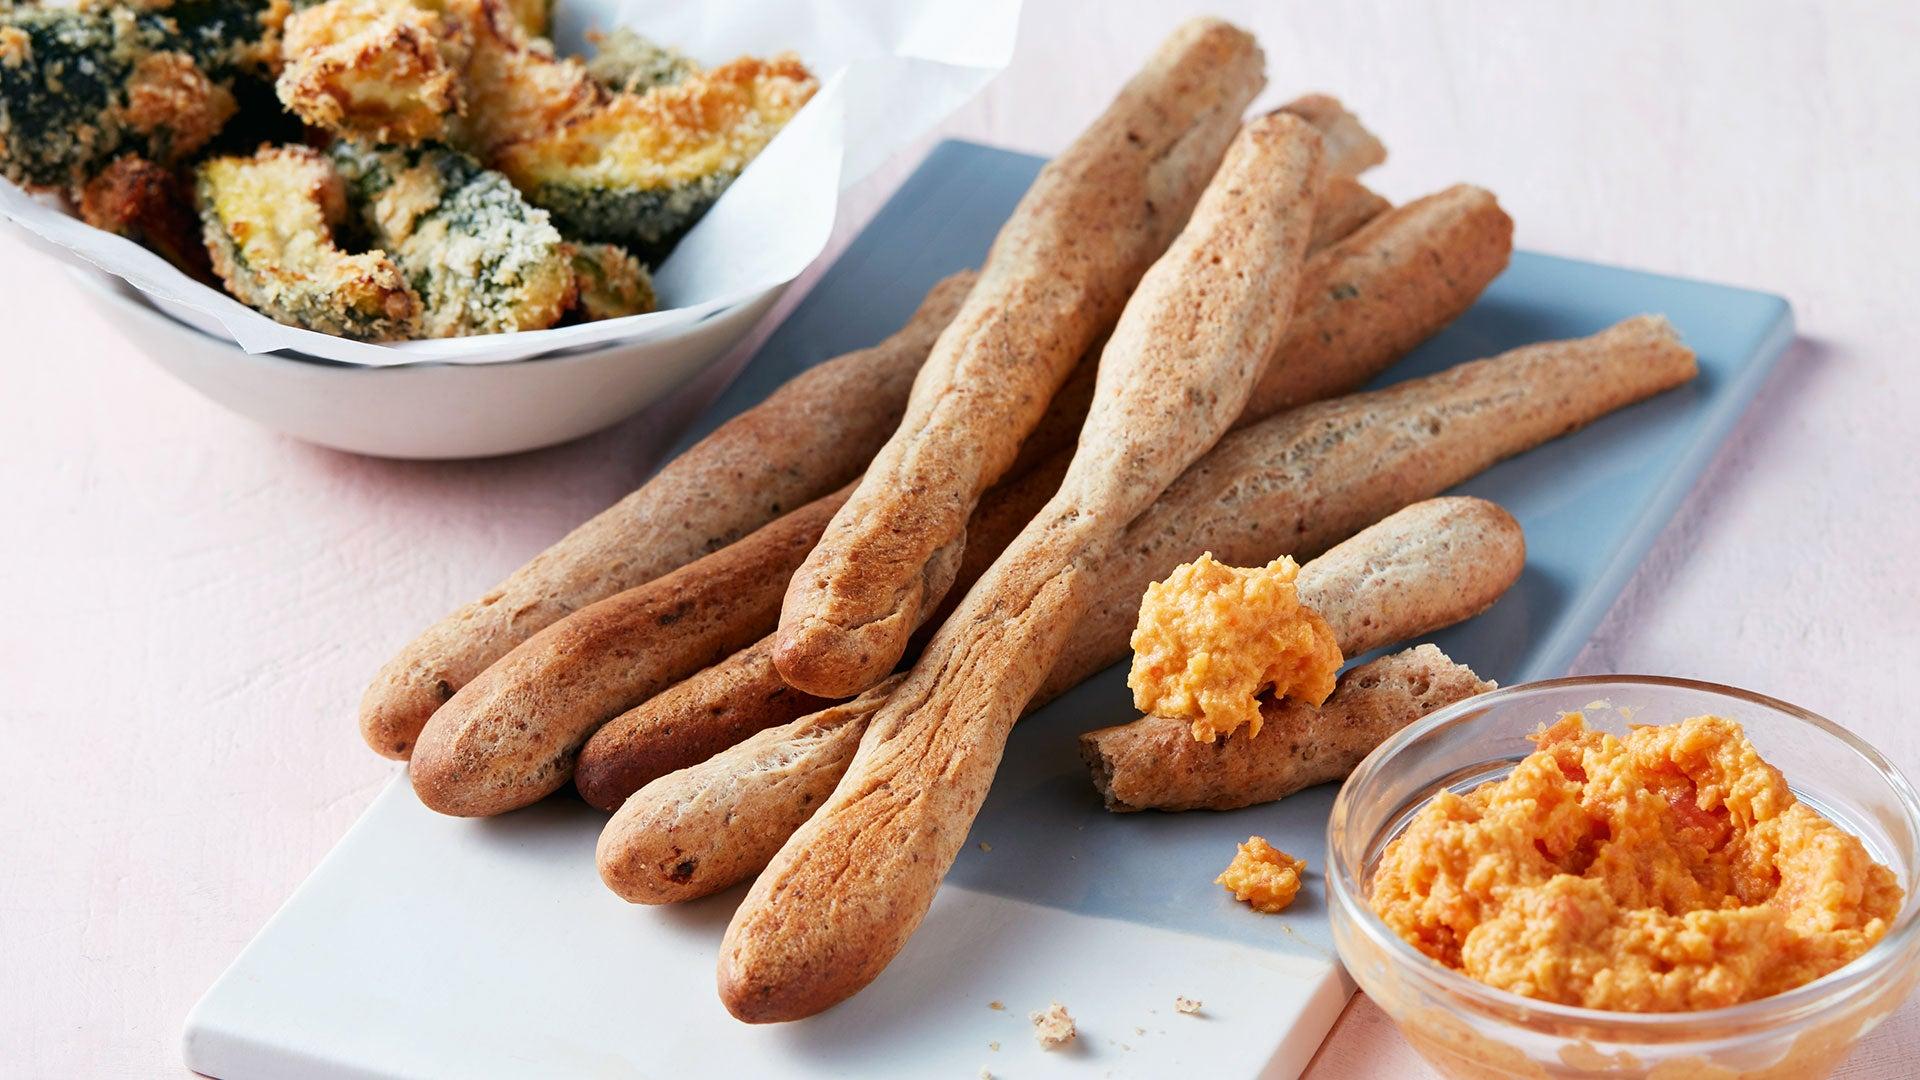 Holly-Willoughby-Breadsticks-Courgette-Crisps-Pepper-Dip_Header.jpg